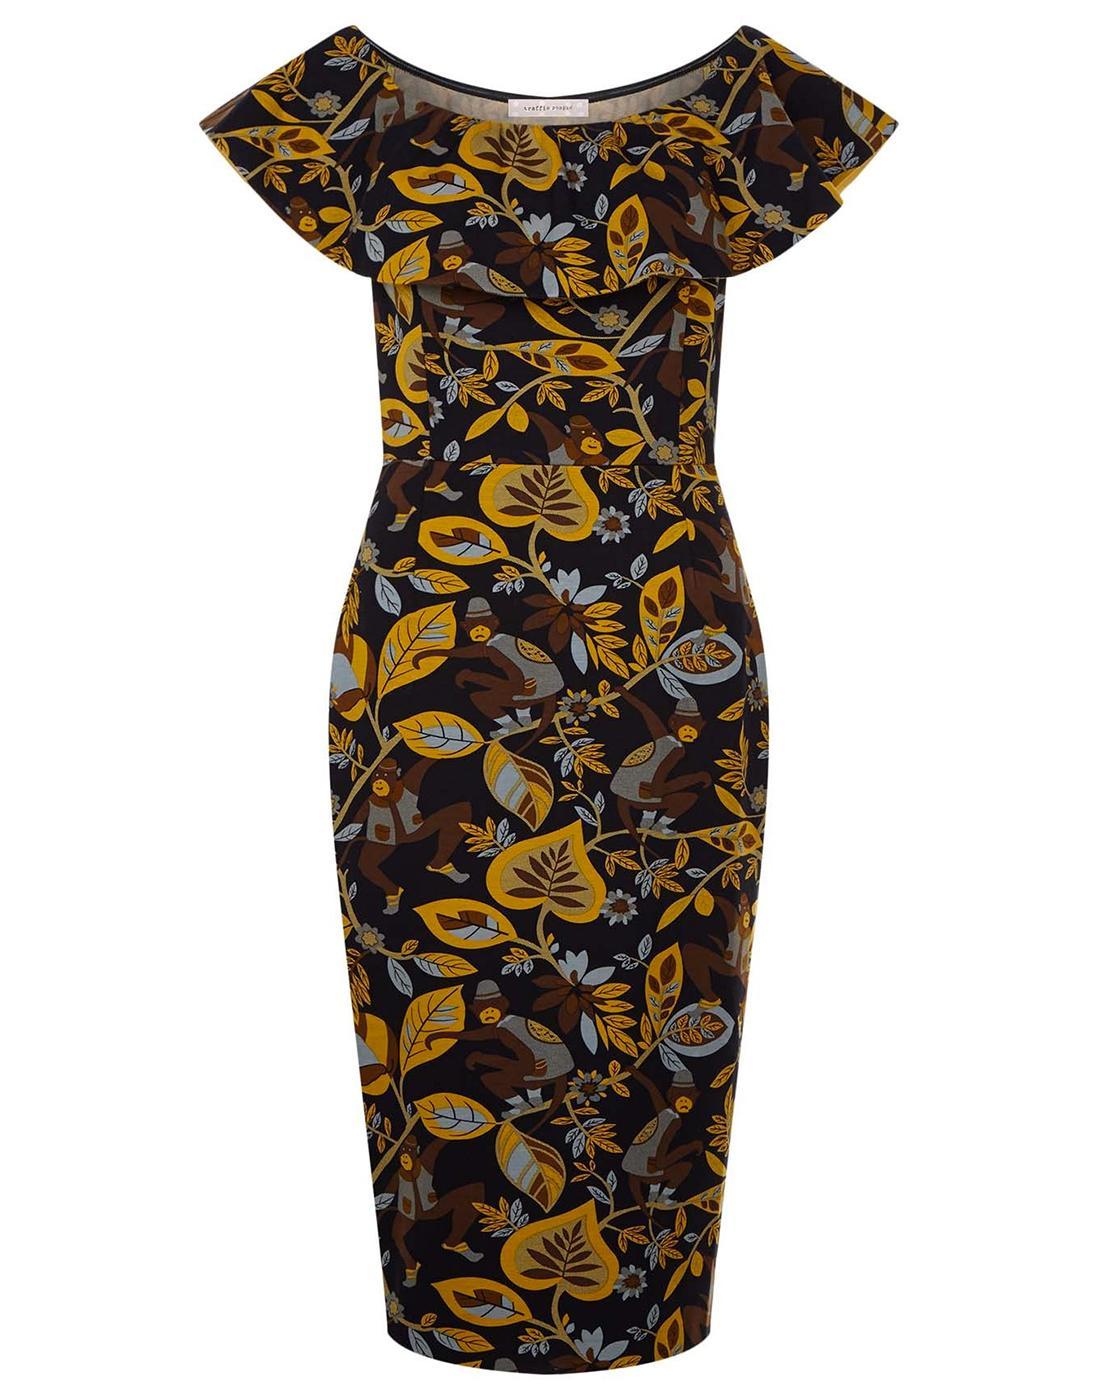 TRAFFIC PEOPLE Retro 50s Vintage Wiggle Dress